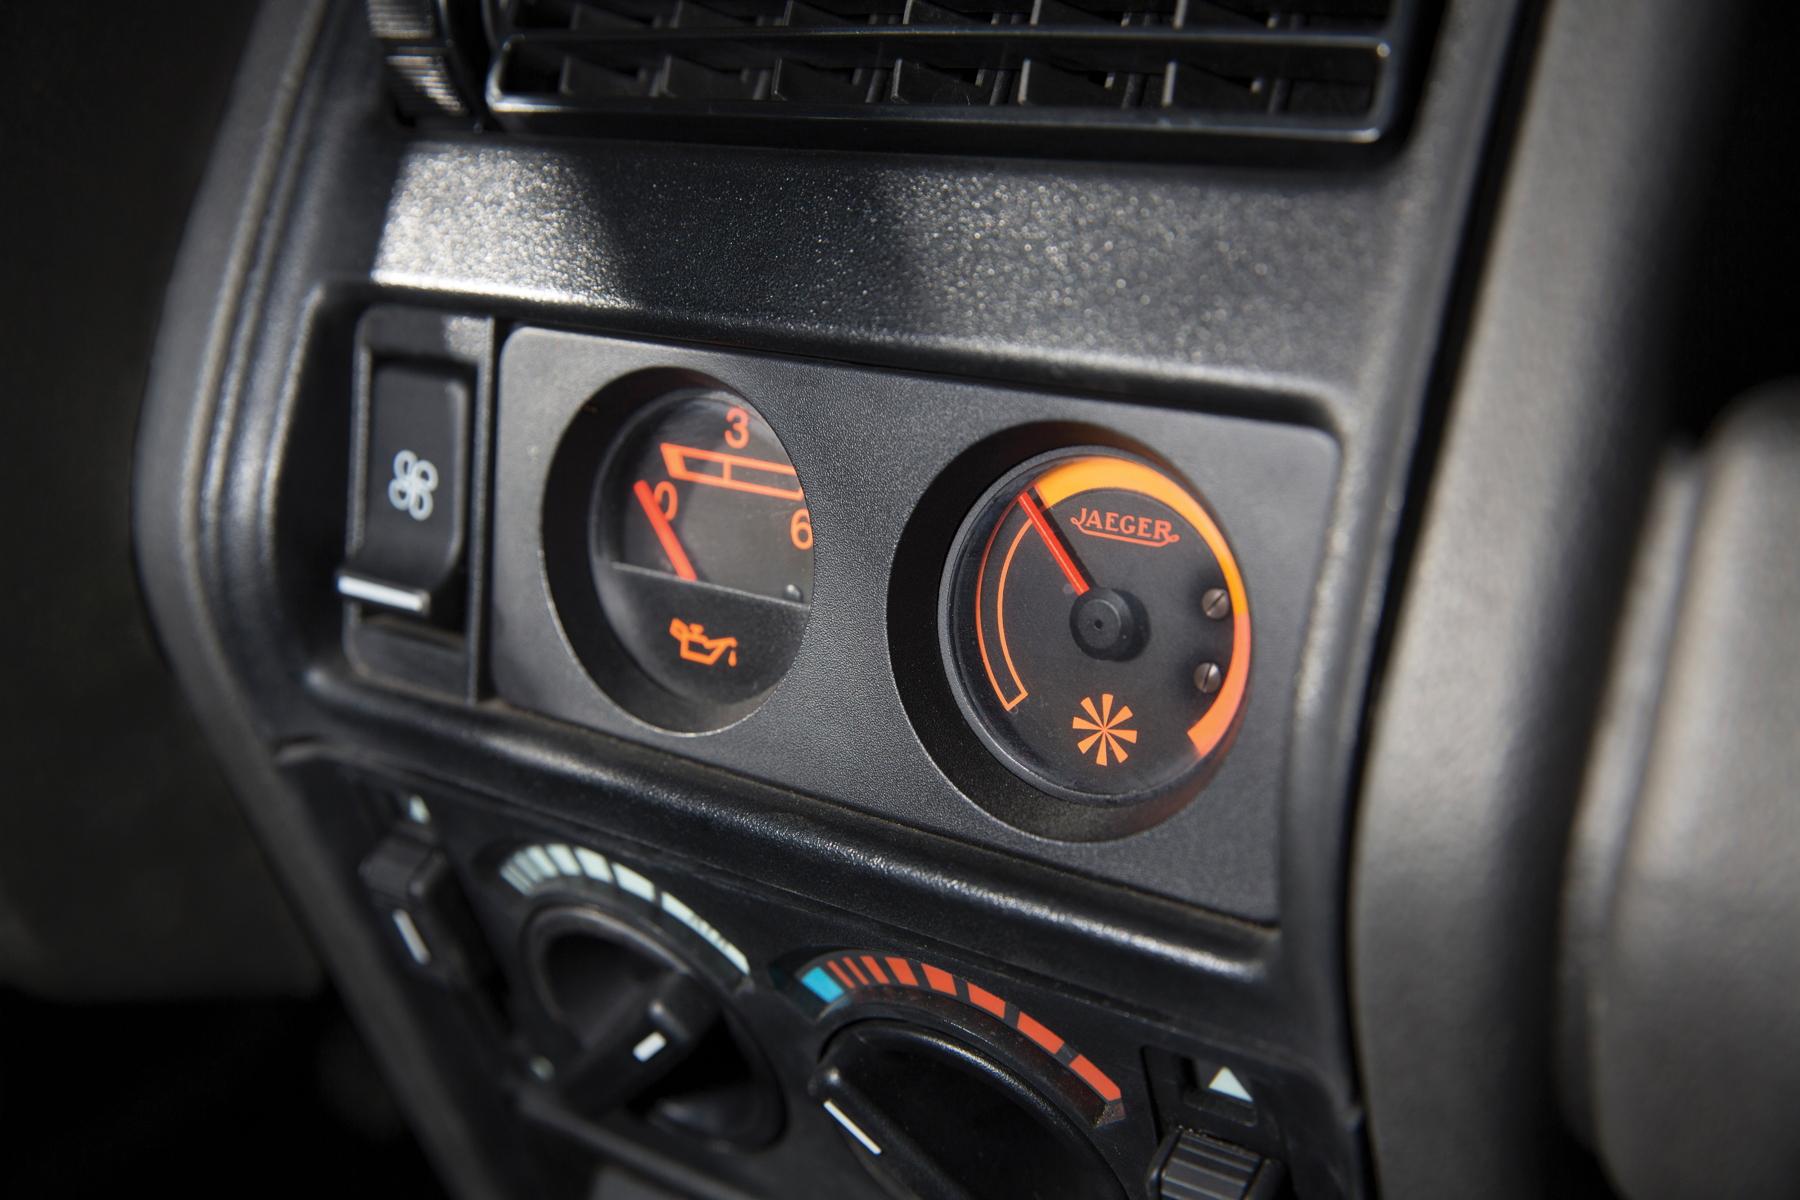 RM Sotheby's Retromobile - Renault 5 Turbo dials